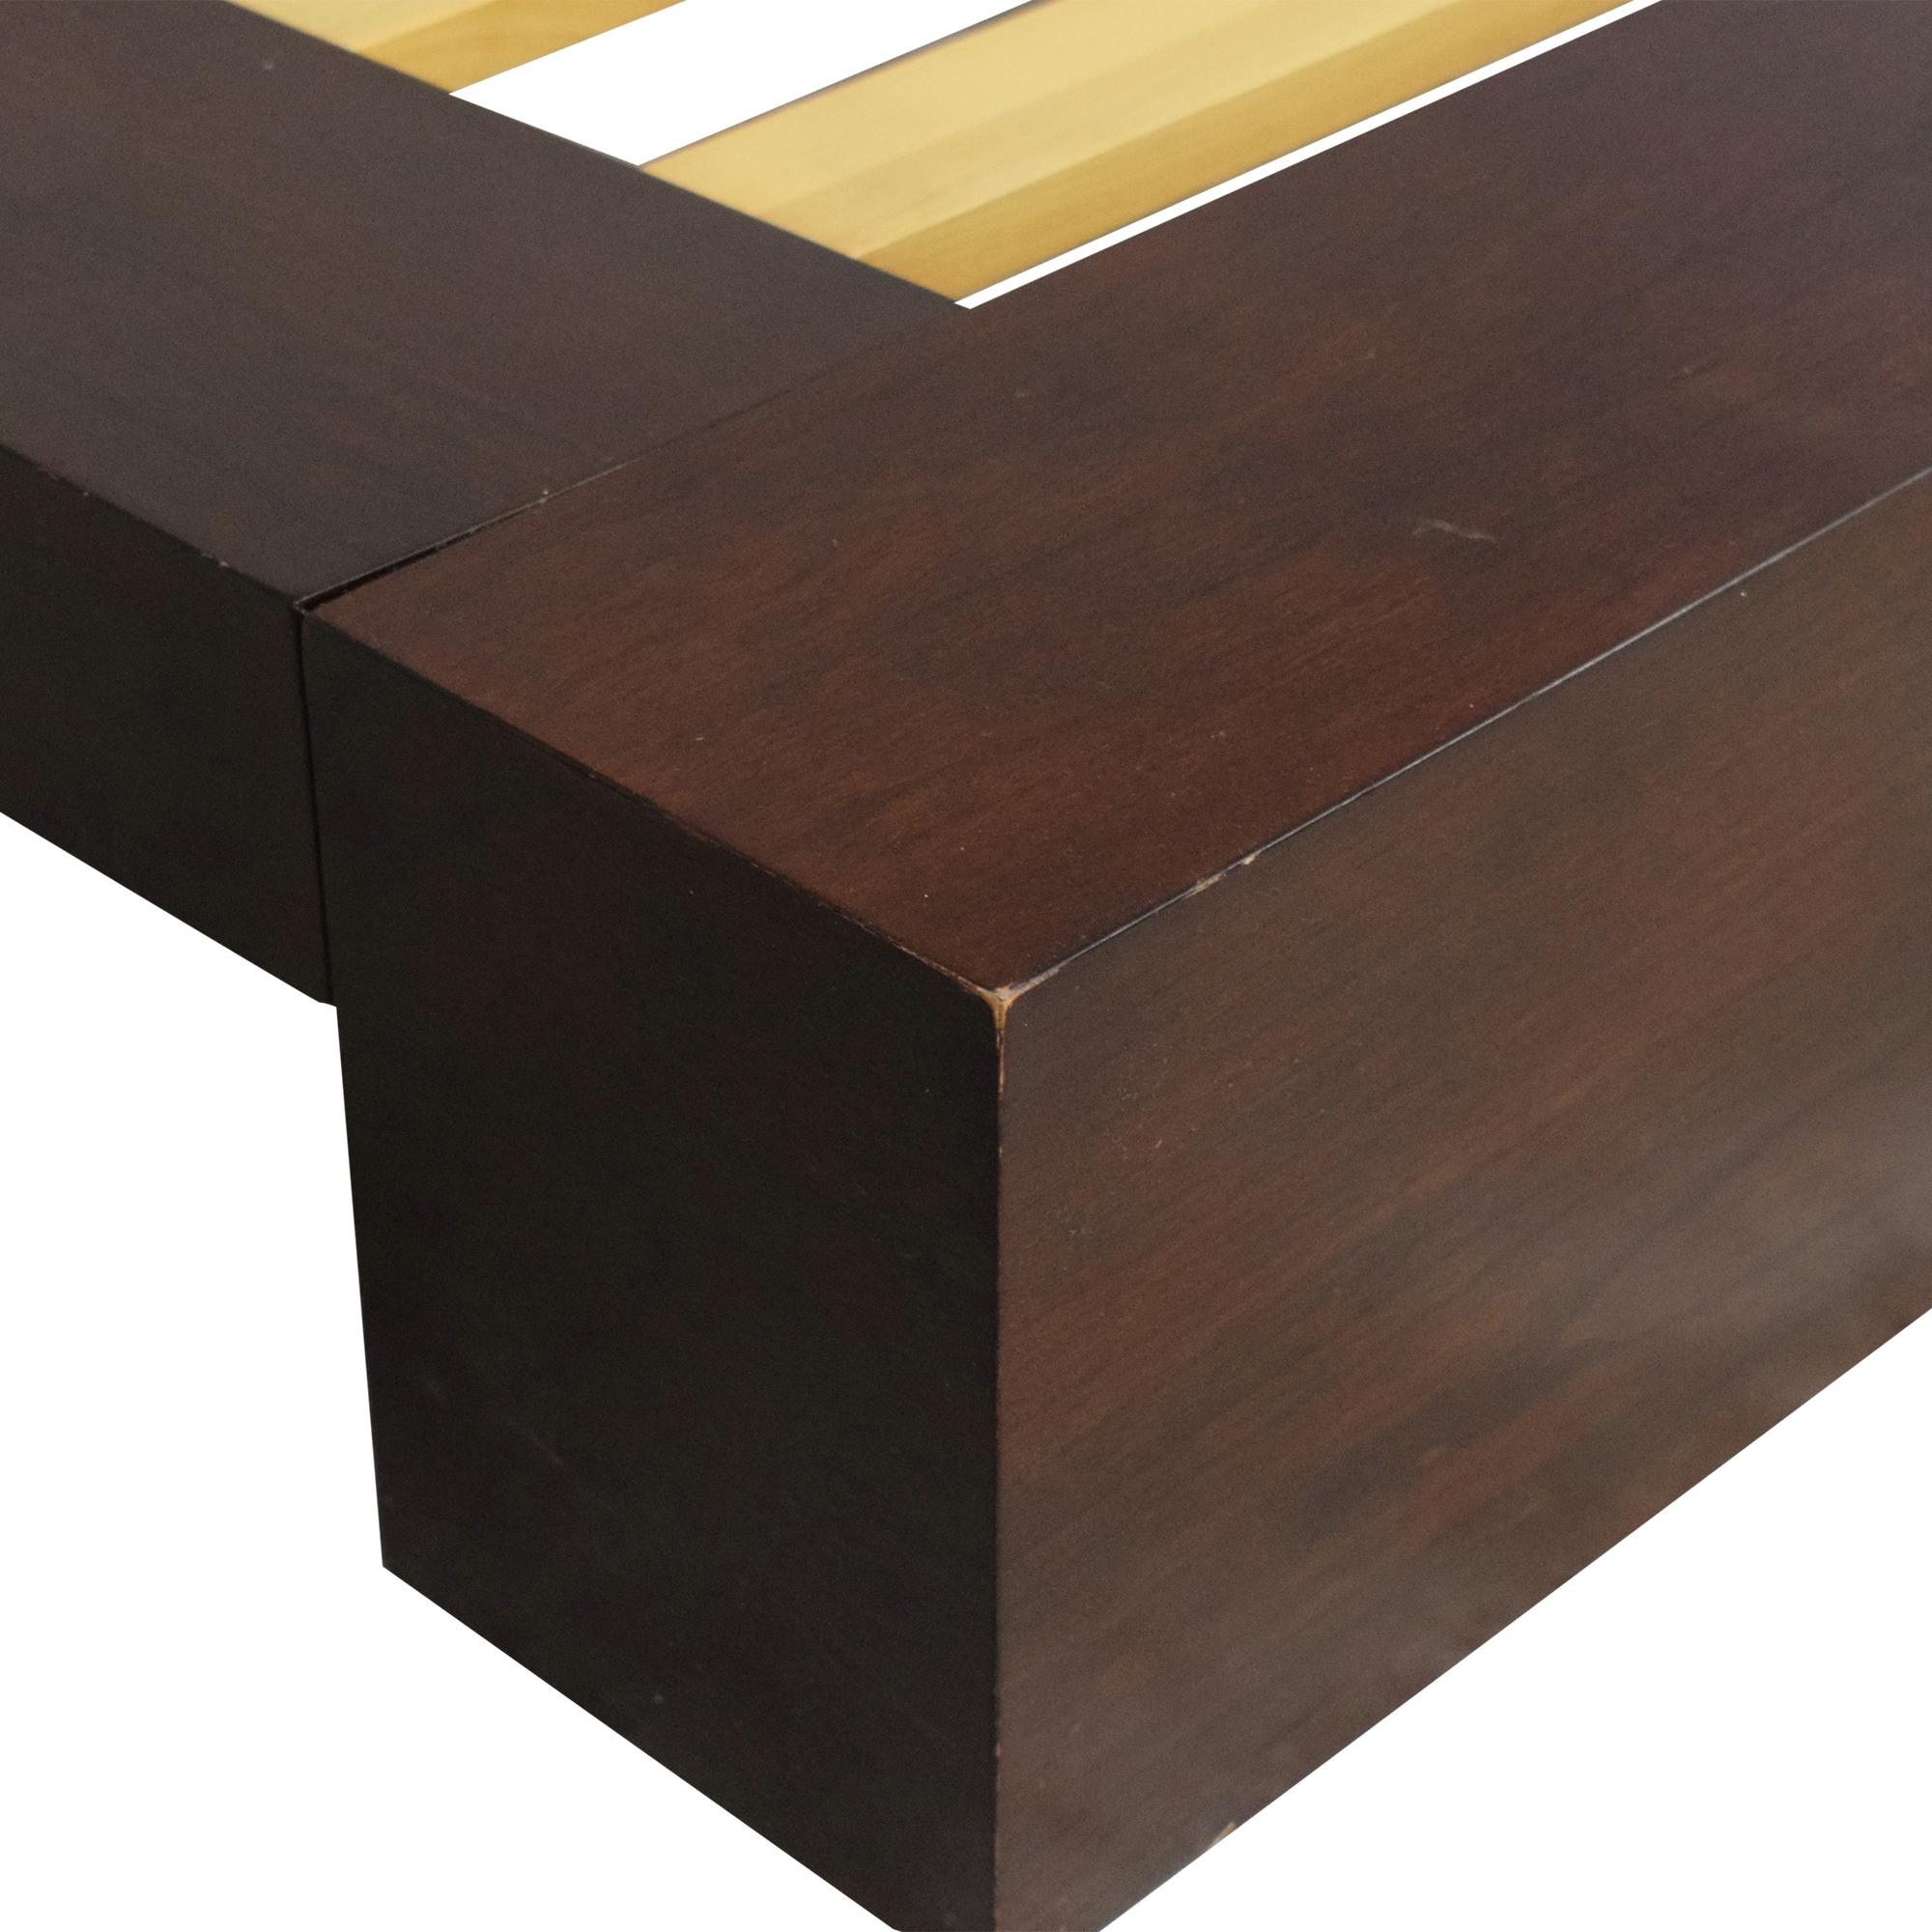 Crate & Barrel Crate & Barrel Asher Queen Bed discount